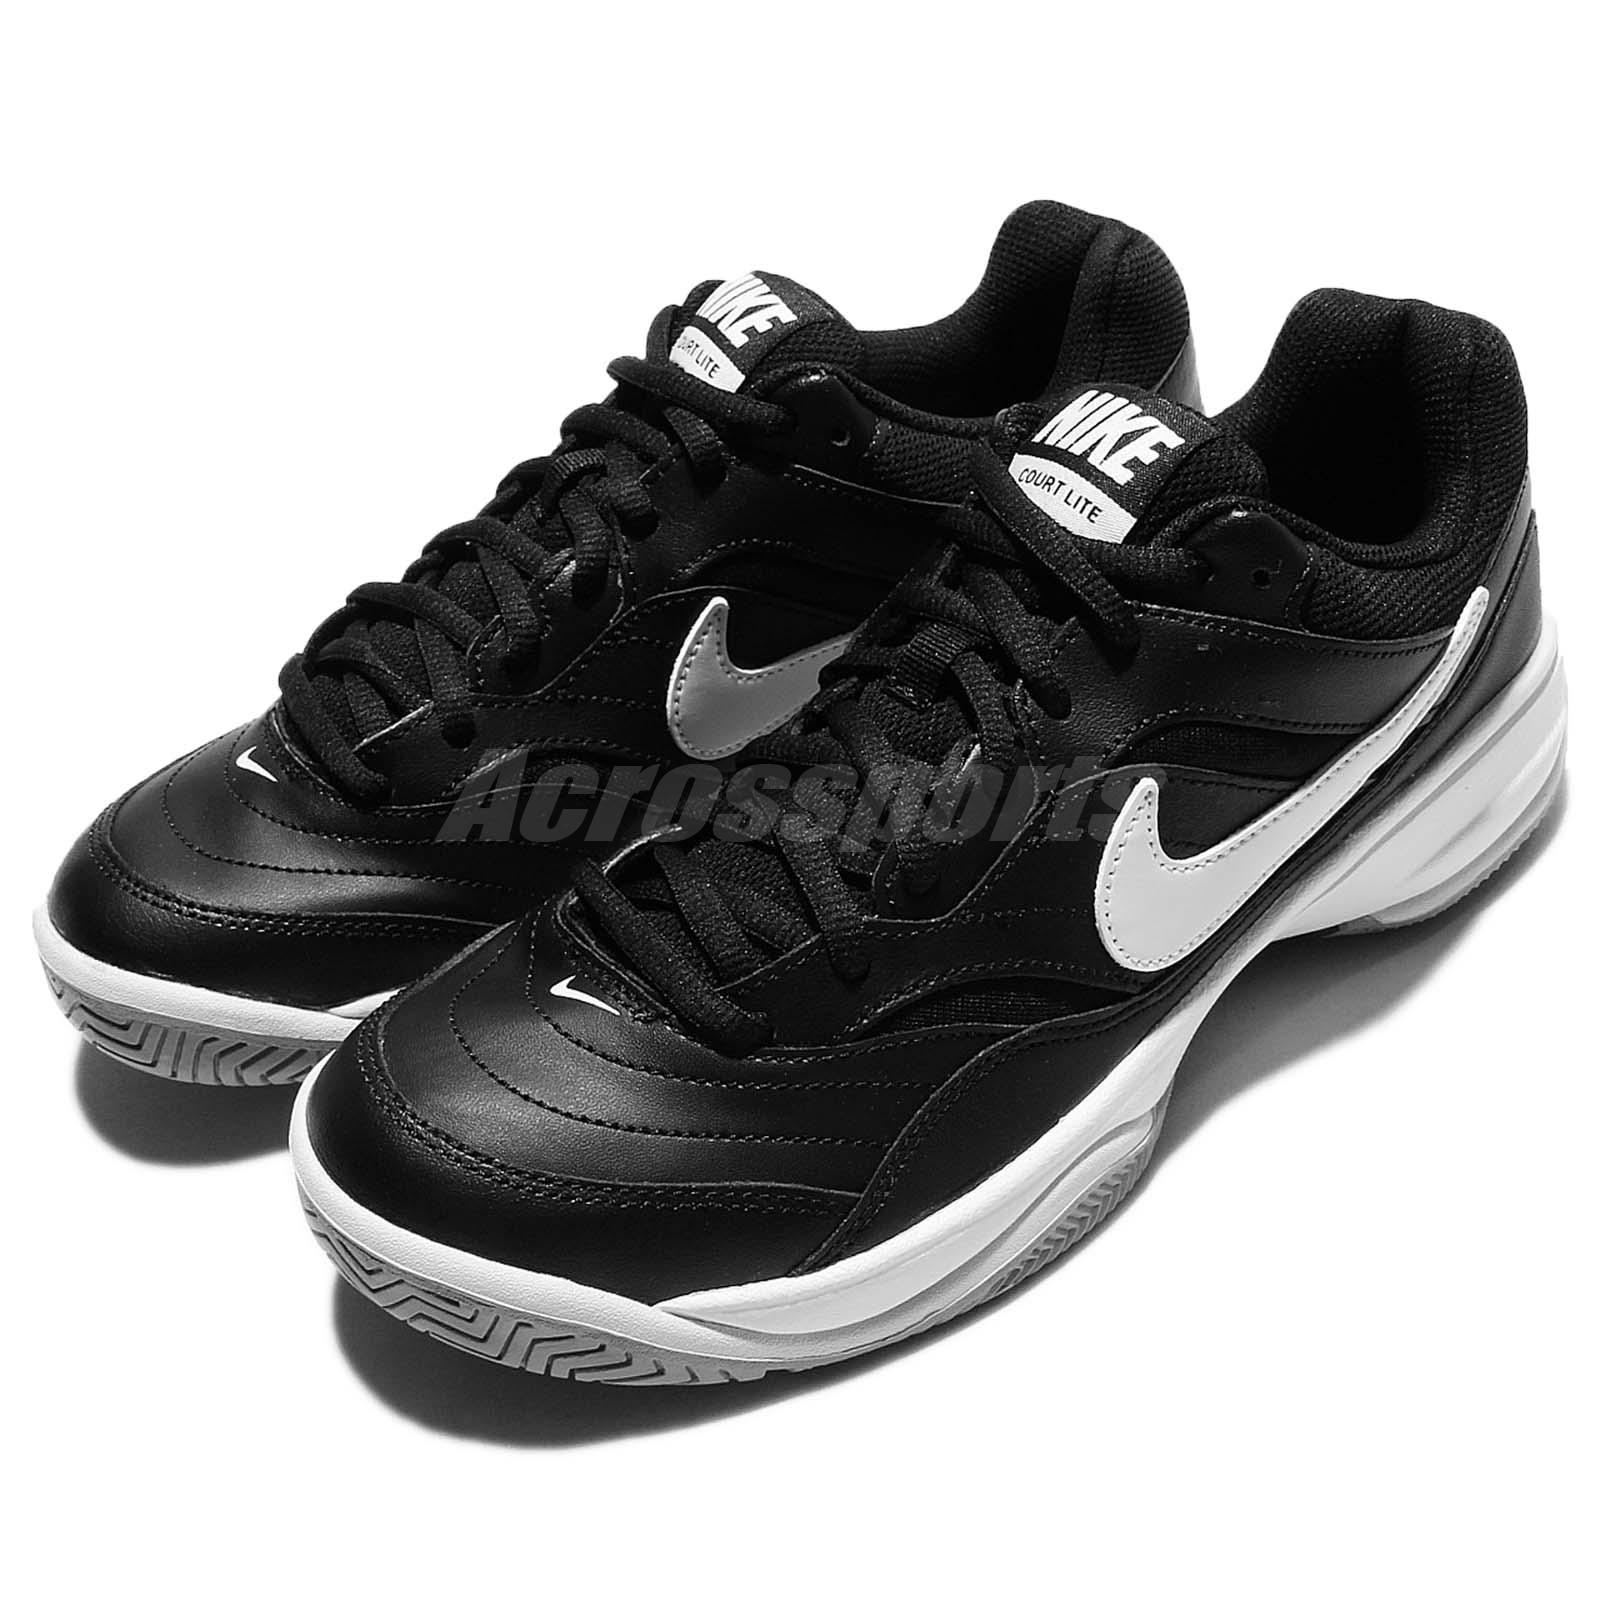 super popular dda21 508d4 Nike Court Lite Black White Mens Tennis Shoes Sneakers Trainers ...